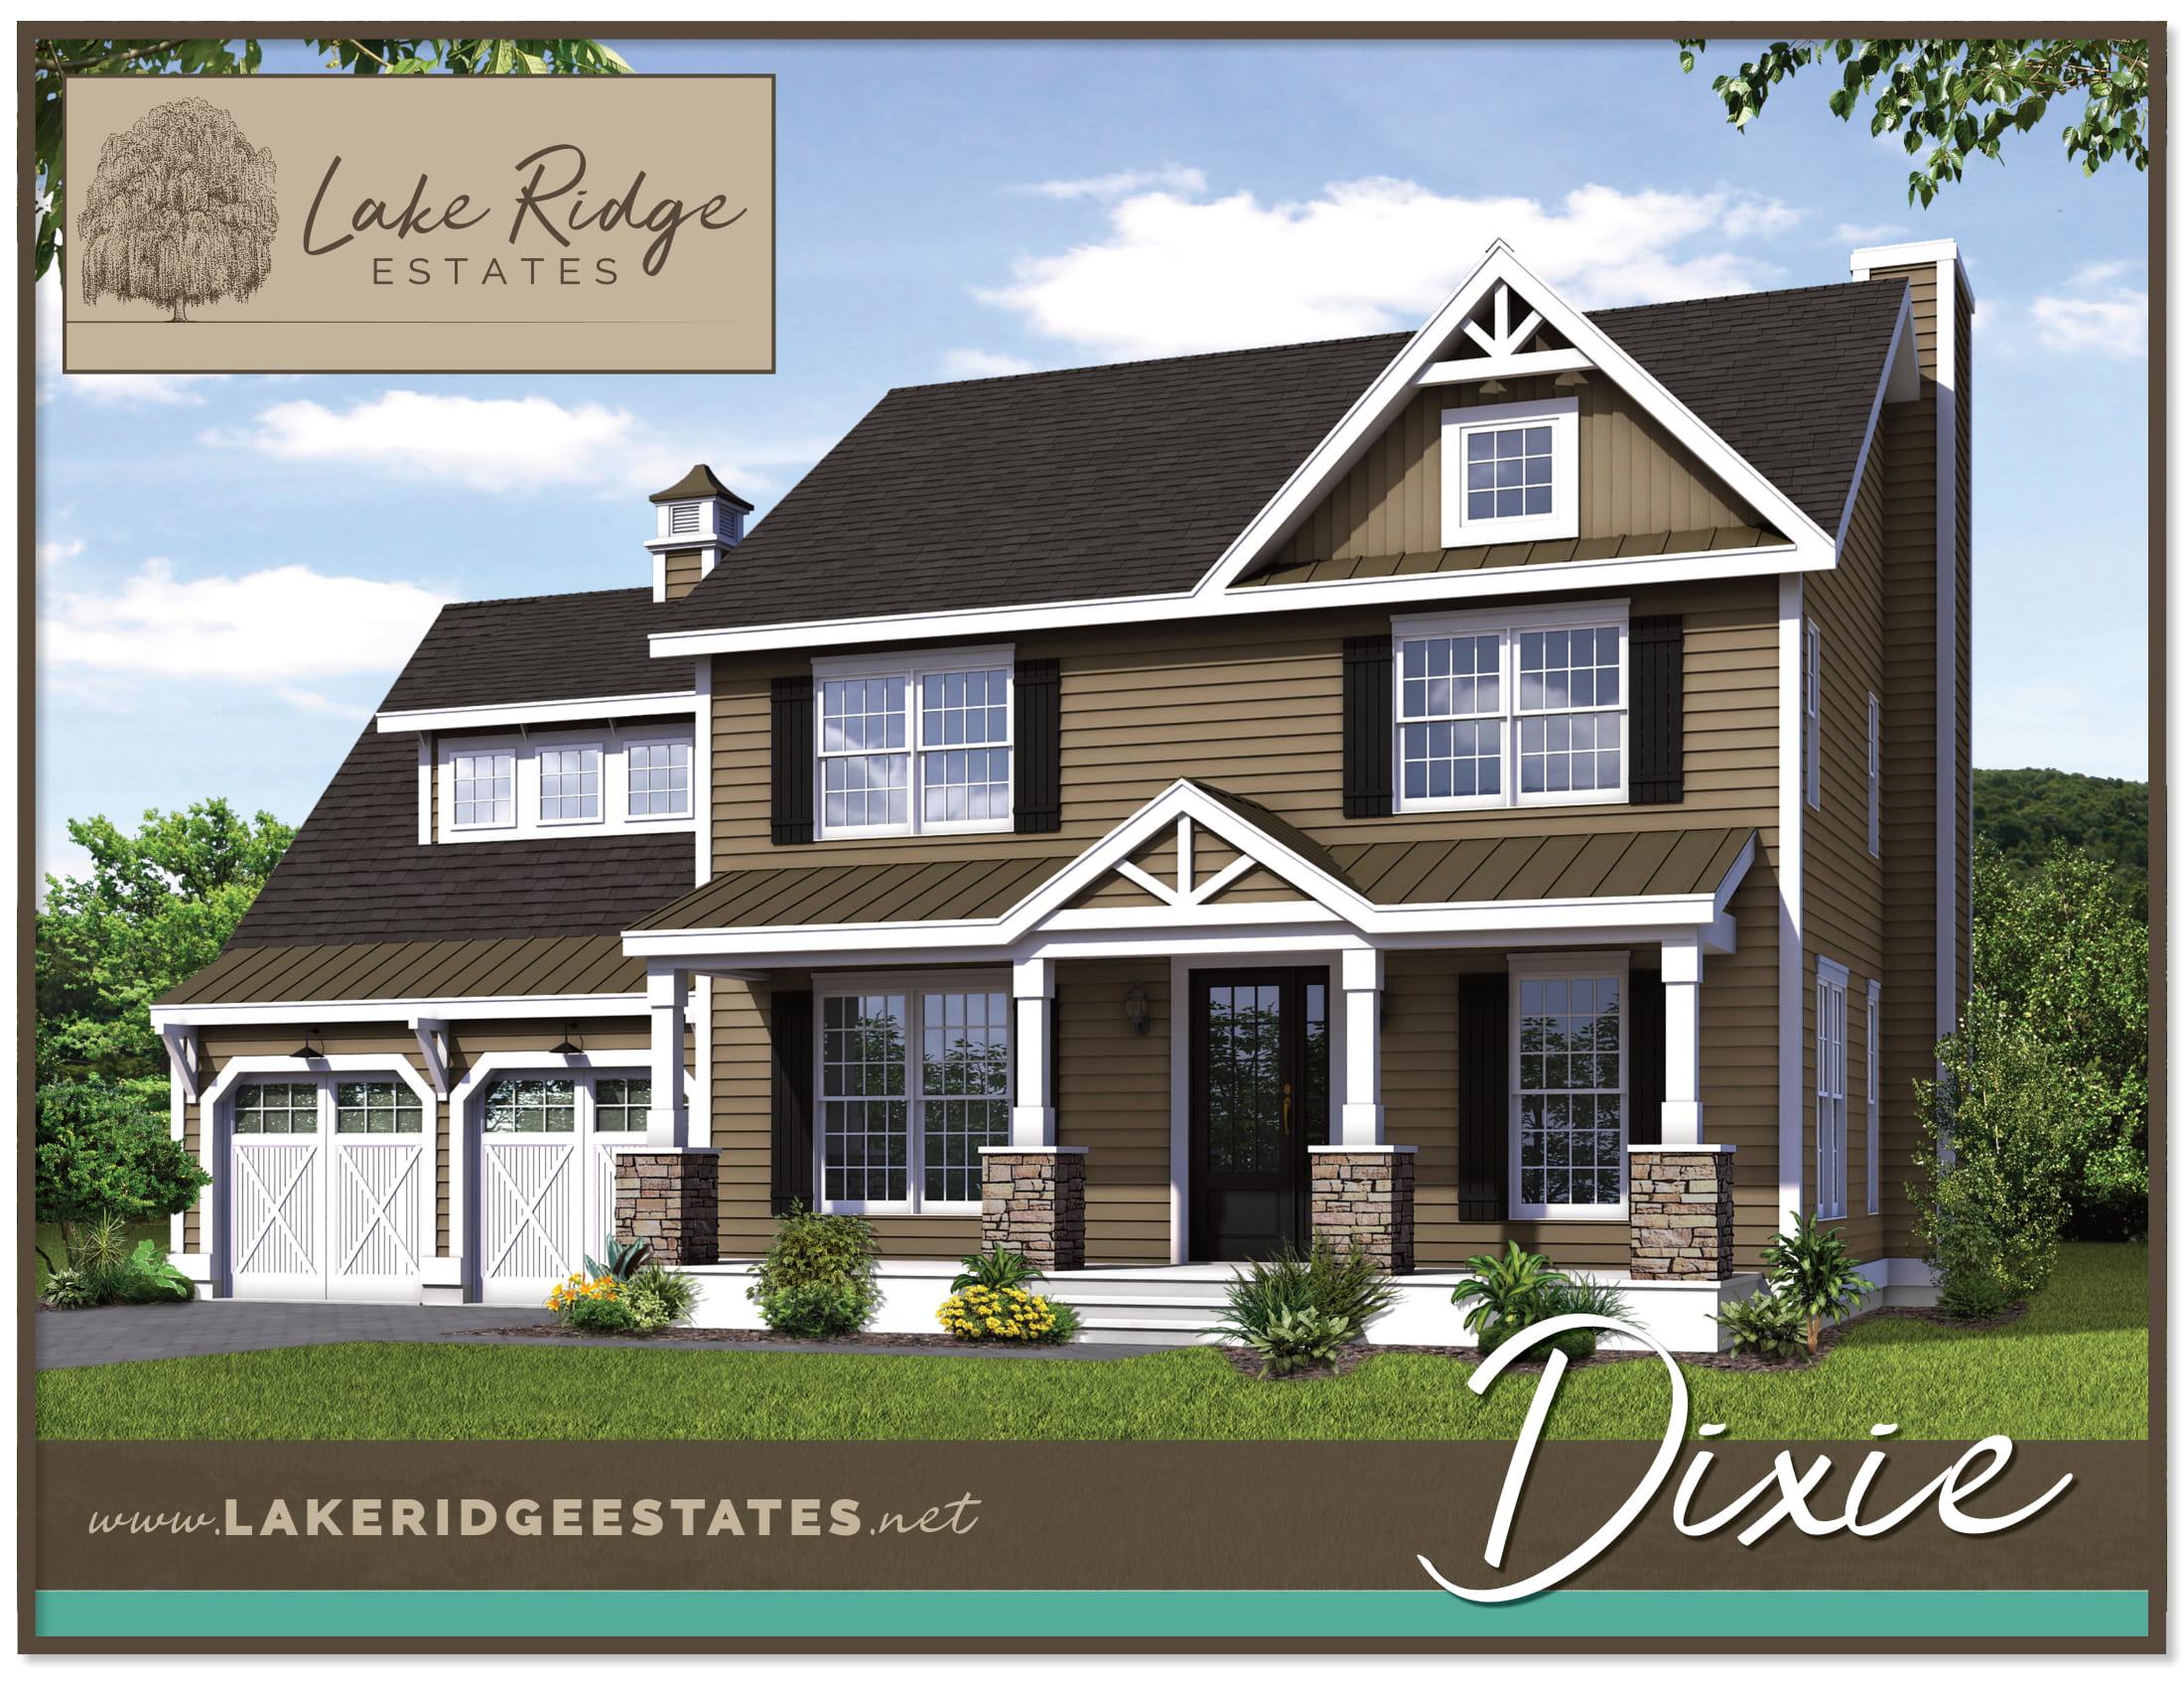 Christopher Ogden Middletown Ny Real Estate Thedixie Lakeridge 1